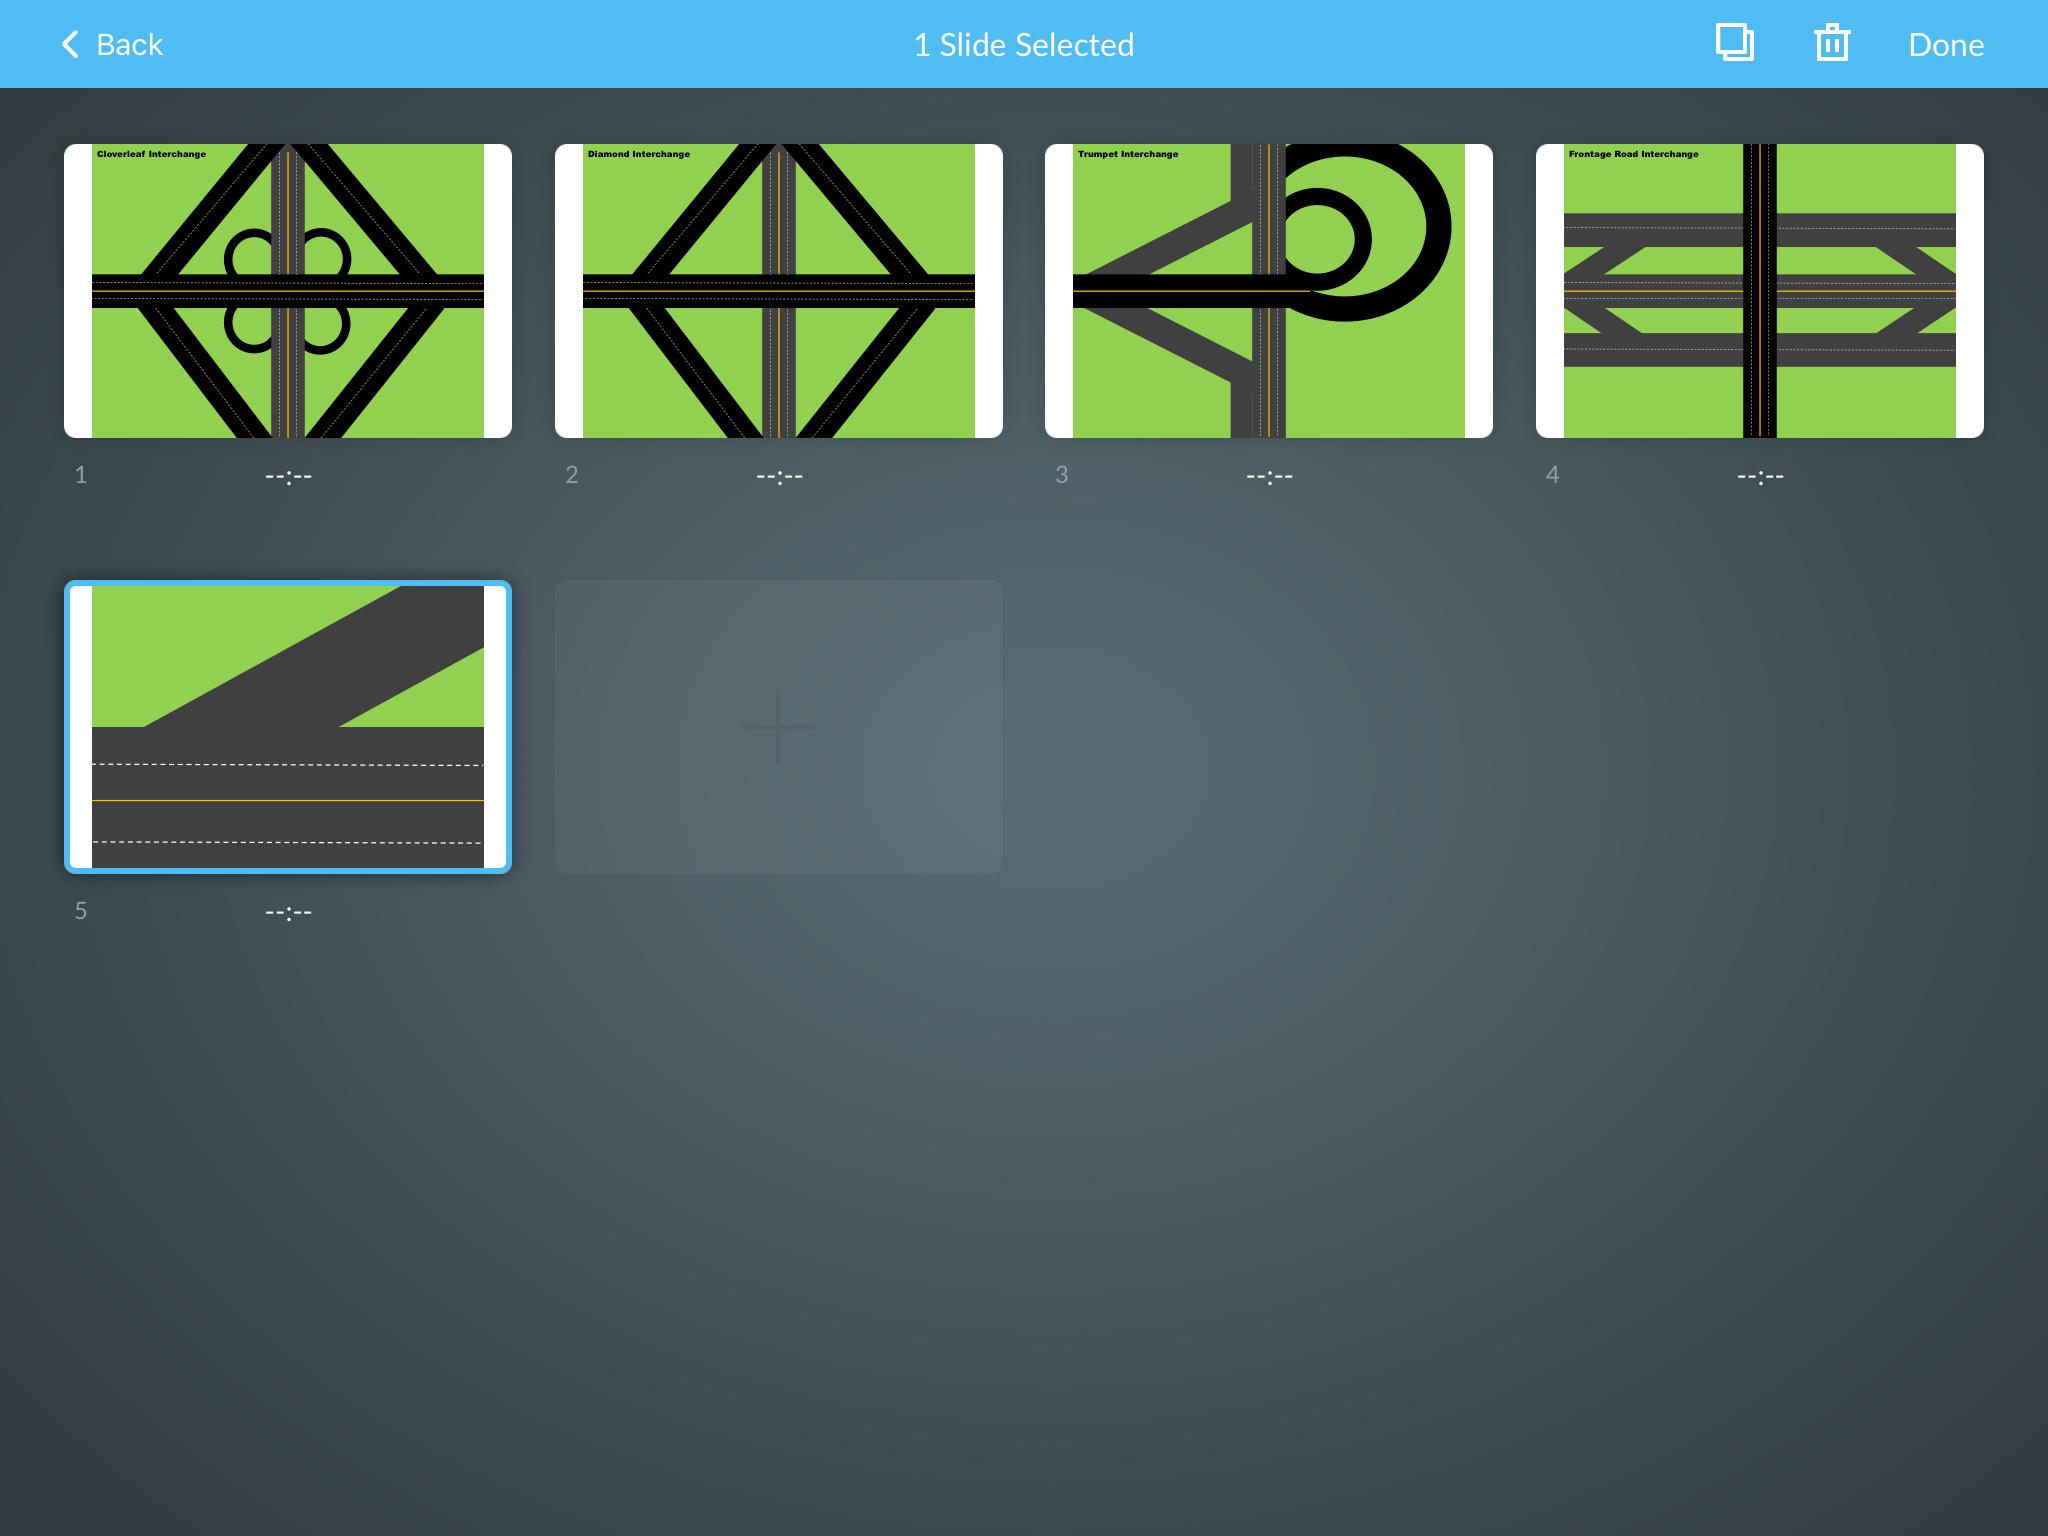 Step 4b: Reorder slides